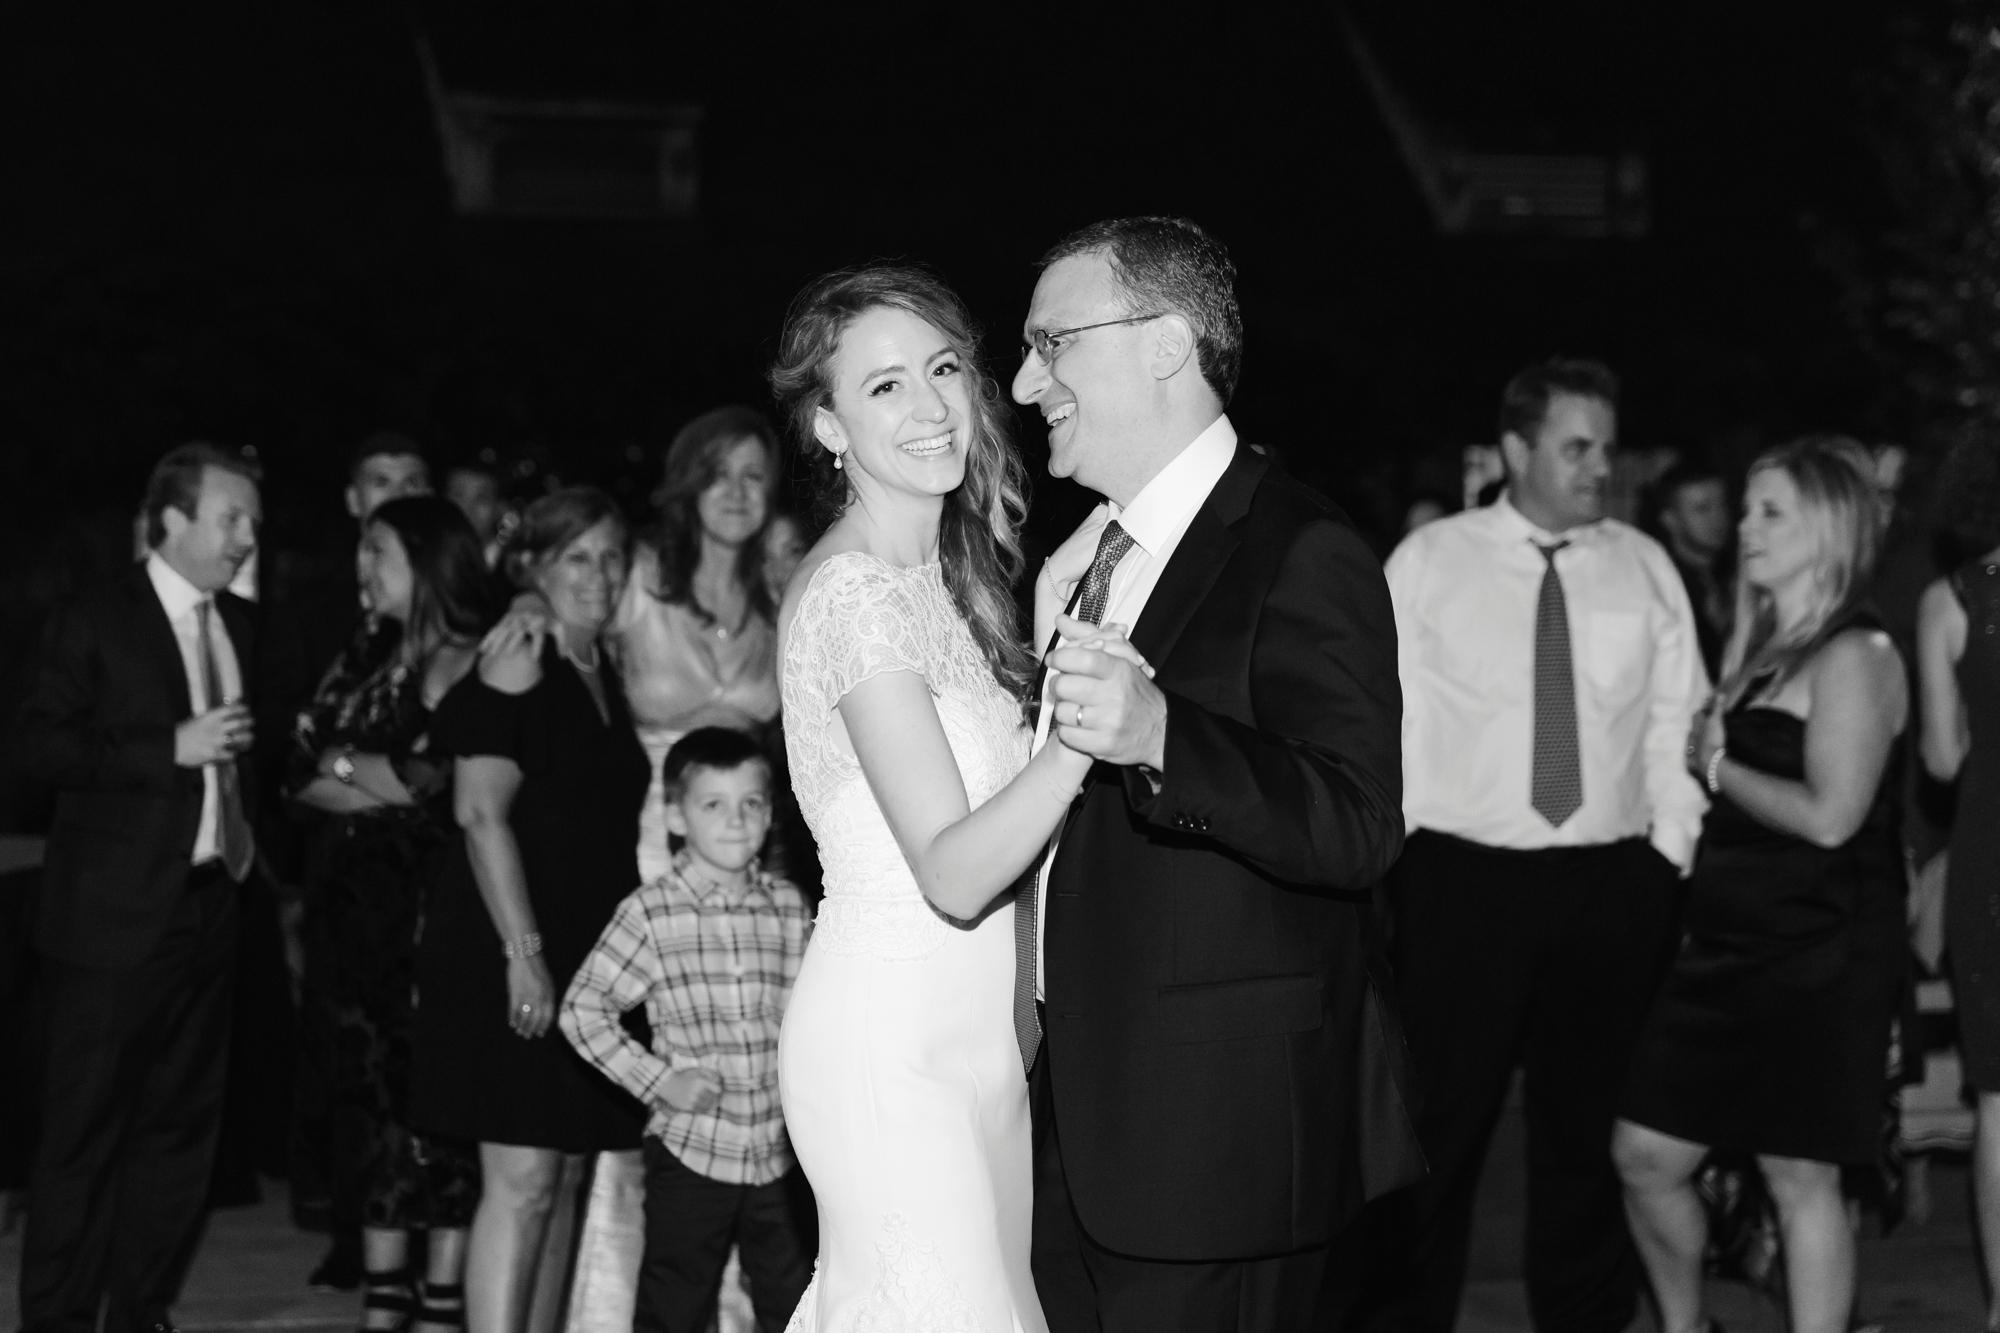 68_Jessica_Ted_Blue_Hill_Stone_Barns_Wedding_Pocantico_NY_Tanya_Salazar_Photography_196.jpg